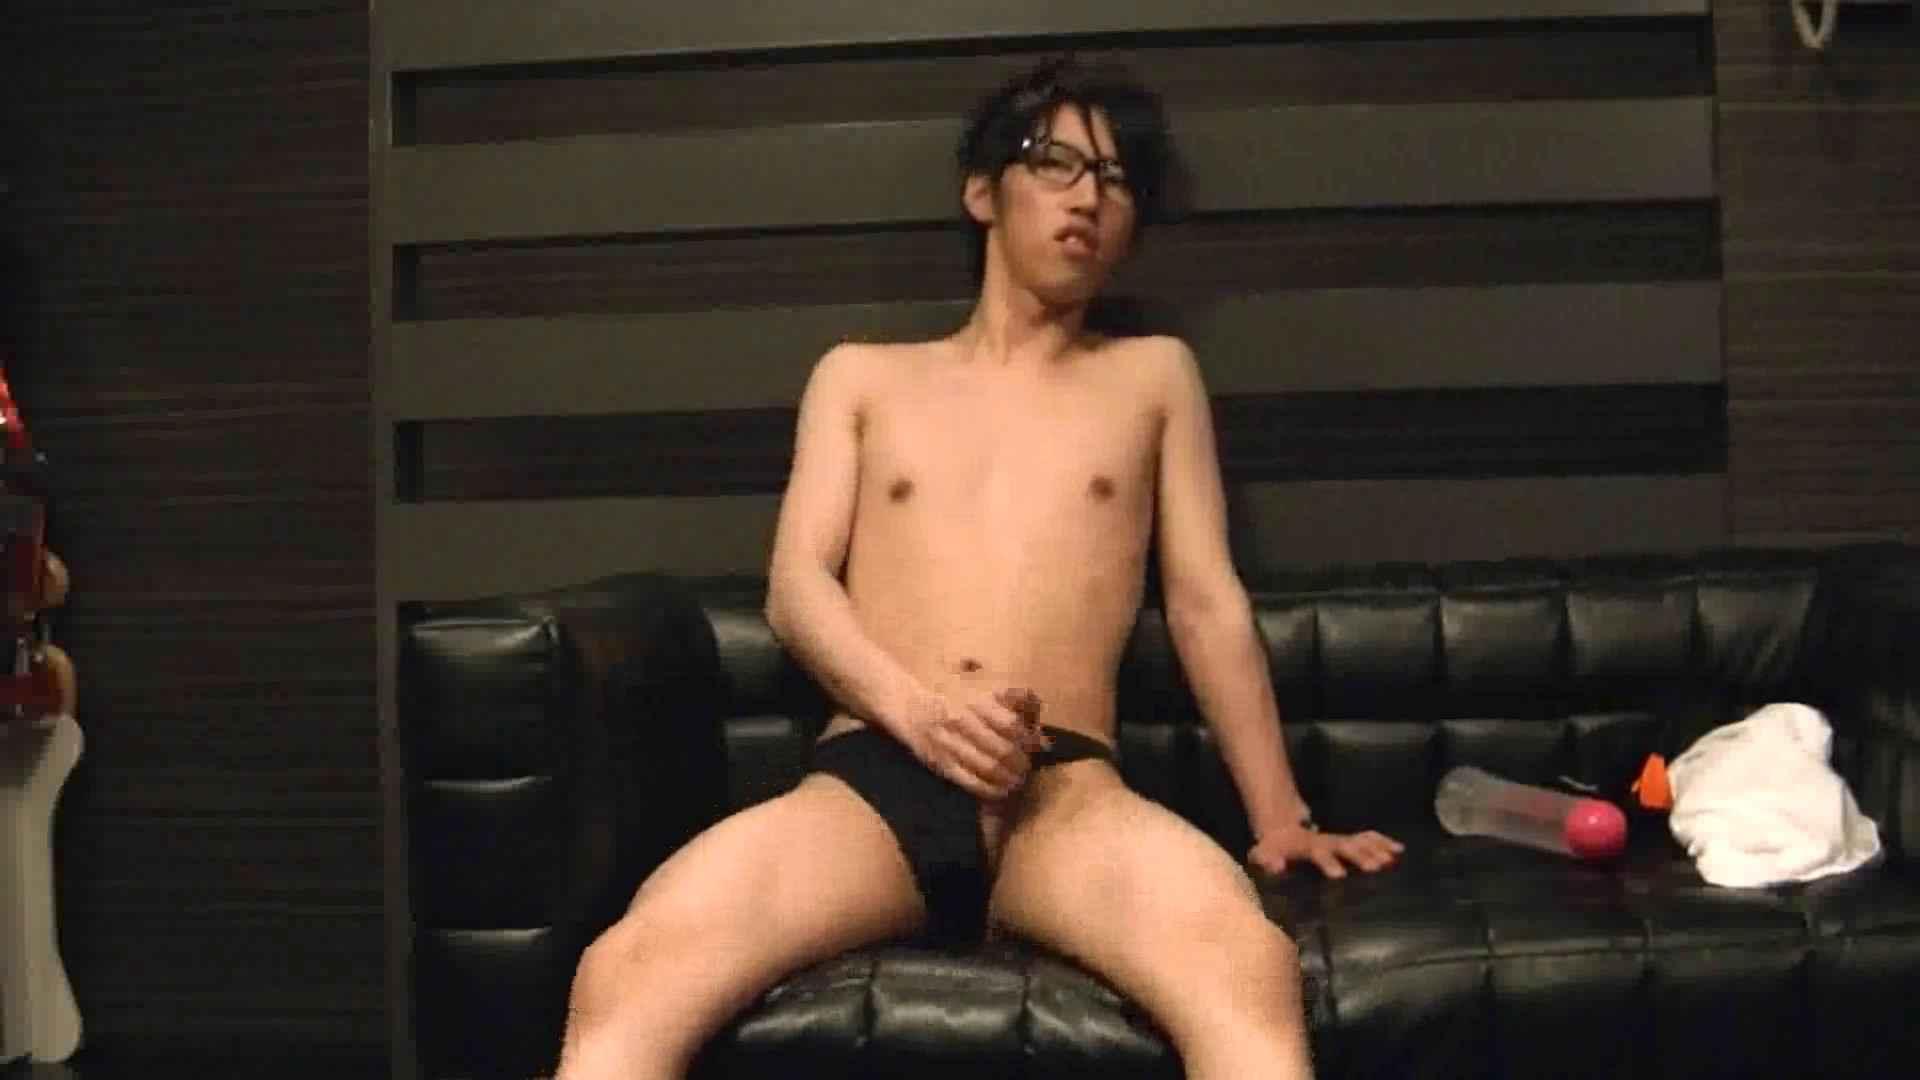 ONA見せカーニバル!! Vol3 男  93pic 71